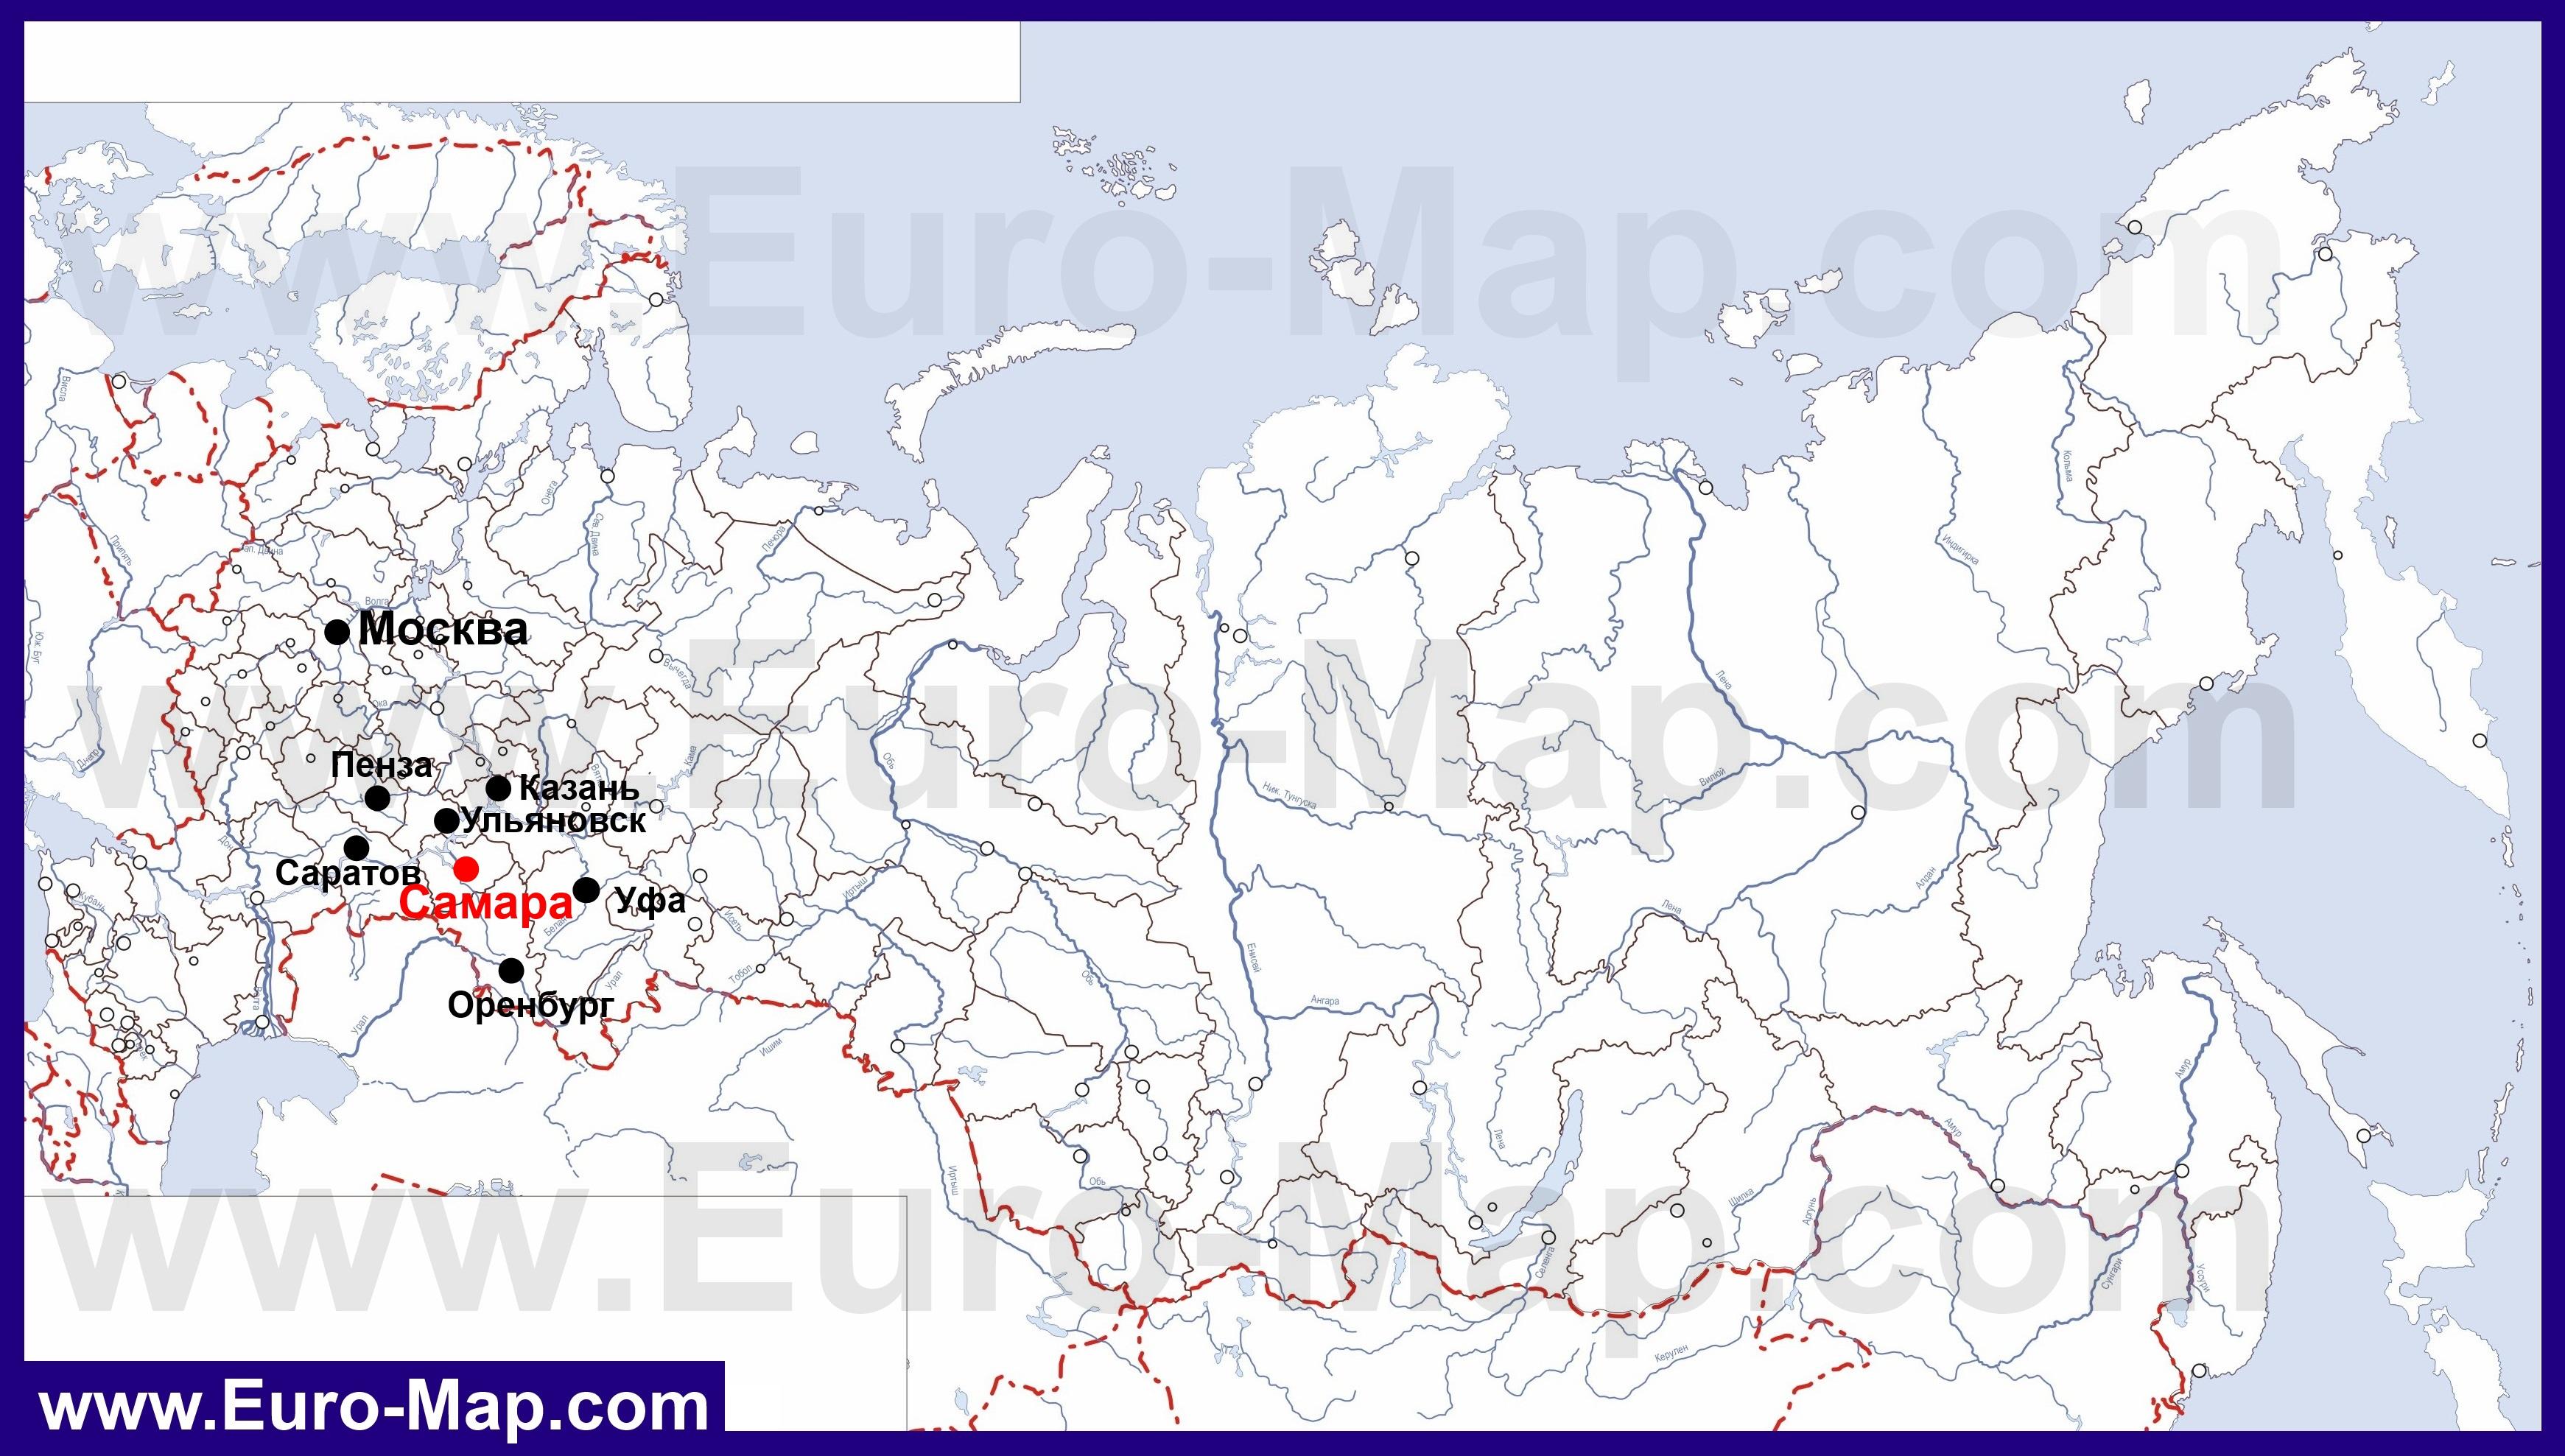 Карты Самары | Подробная карта города ...: euro-map.com/karty-rossii/samara